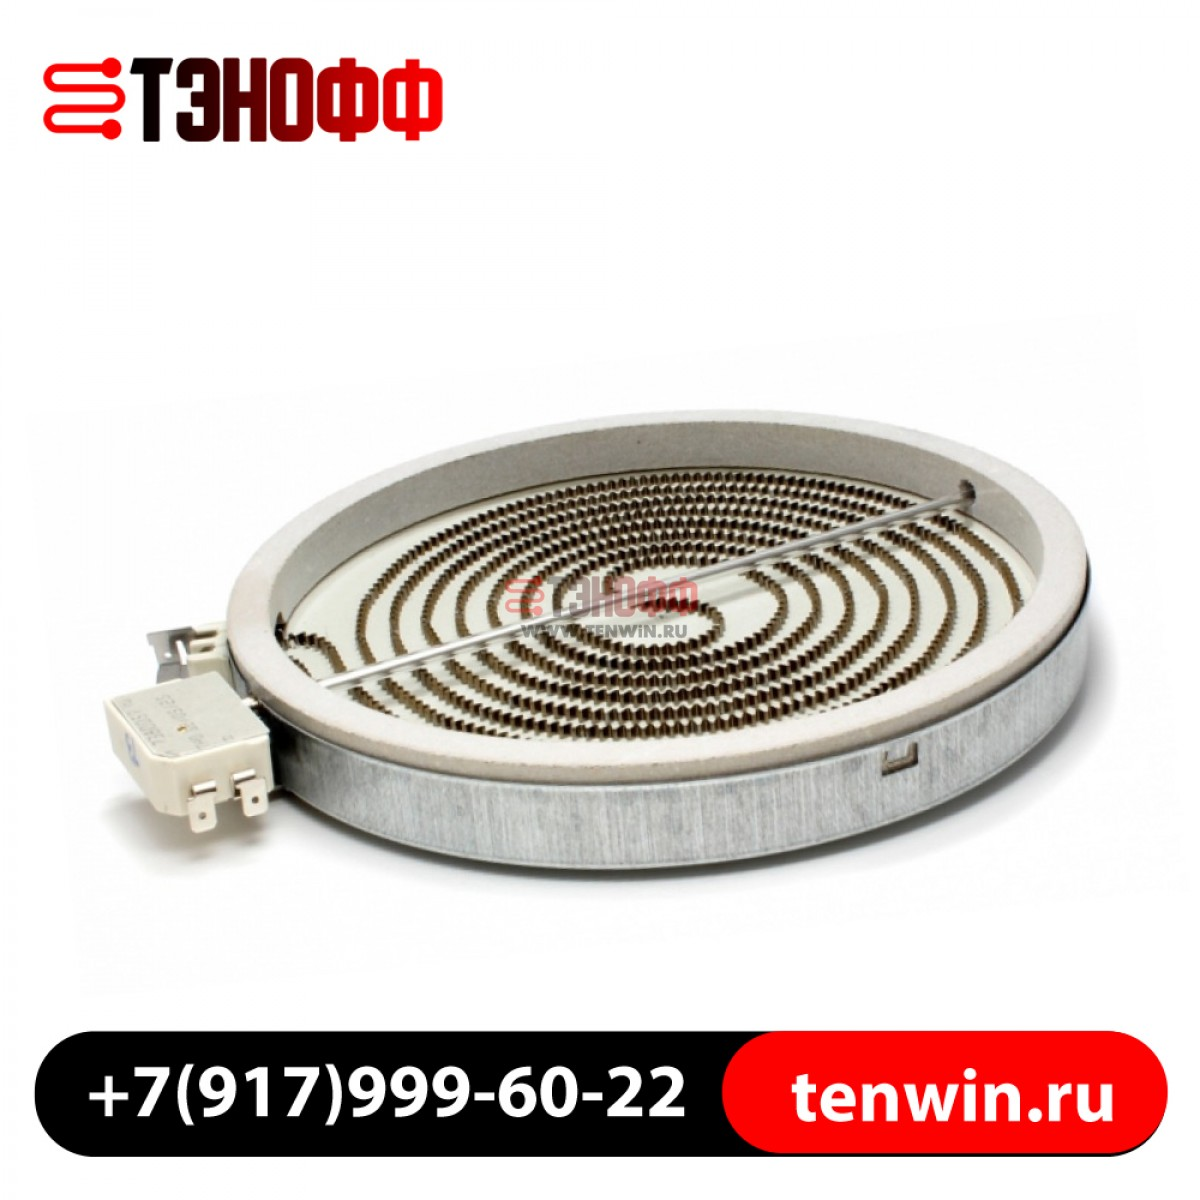 Конфорка 1700Вт / 200мм стеклокерамика hi-light